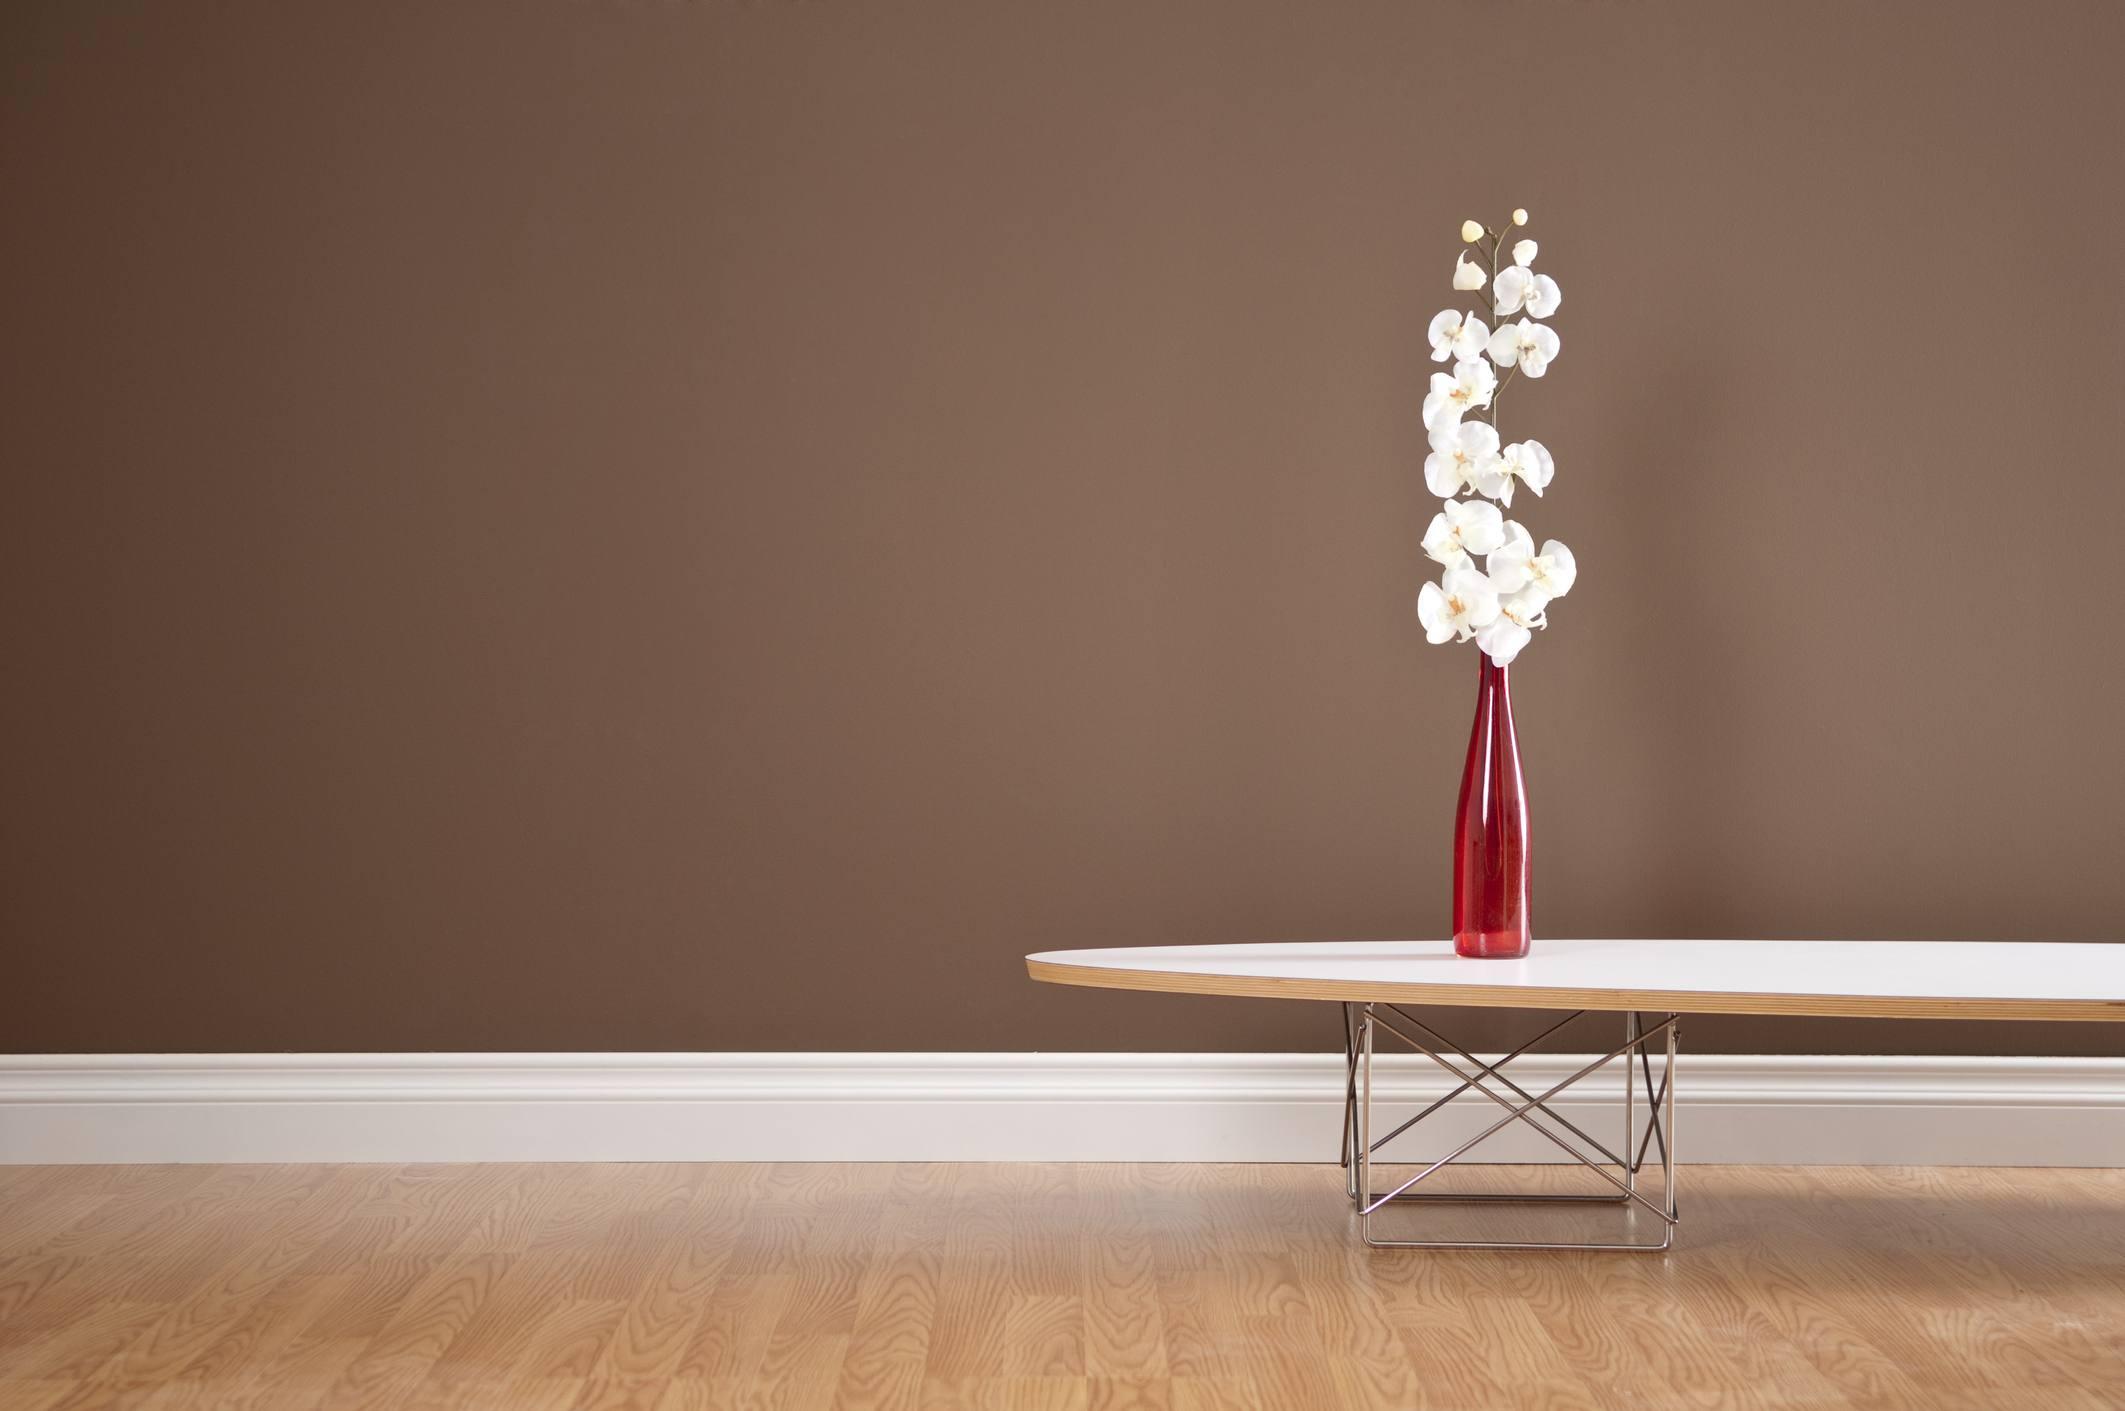 Sala de estar con mesa de centro moderna con flores en un jarrón rojo